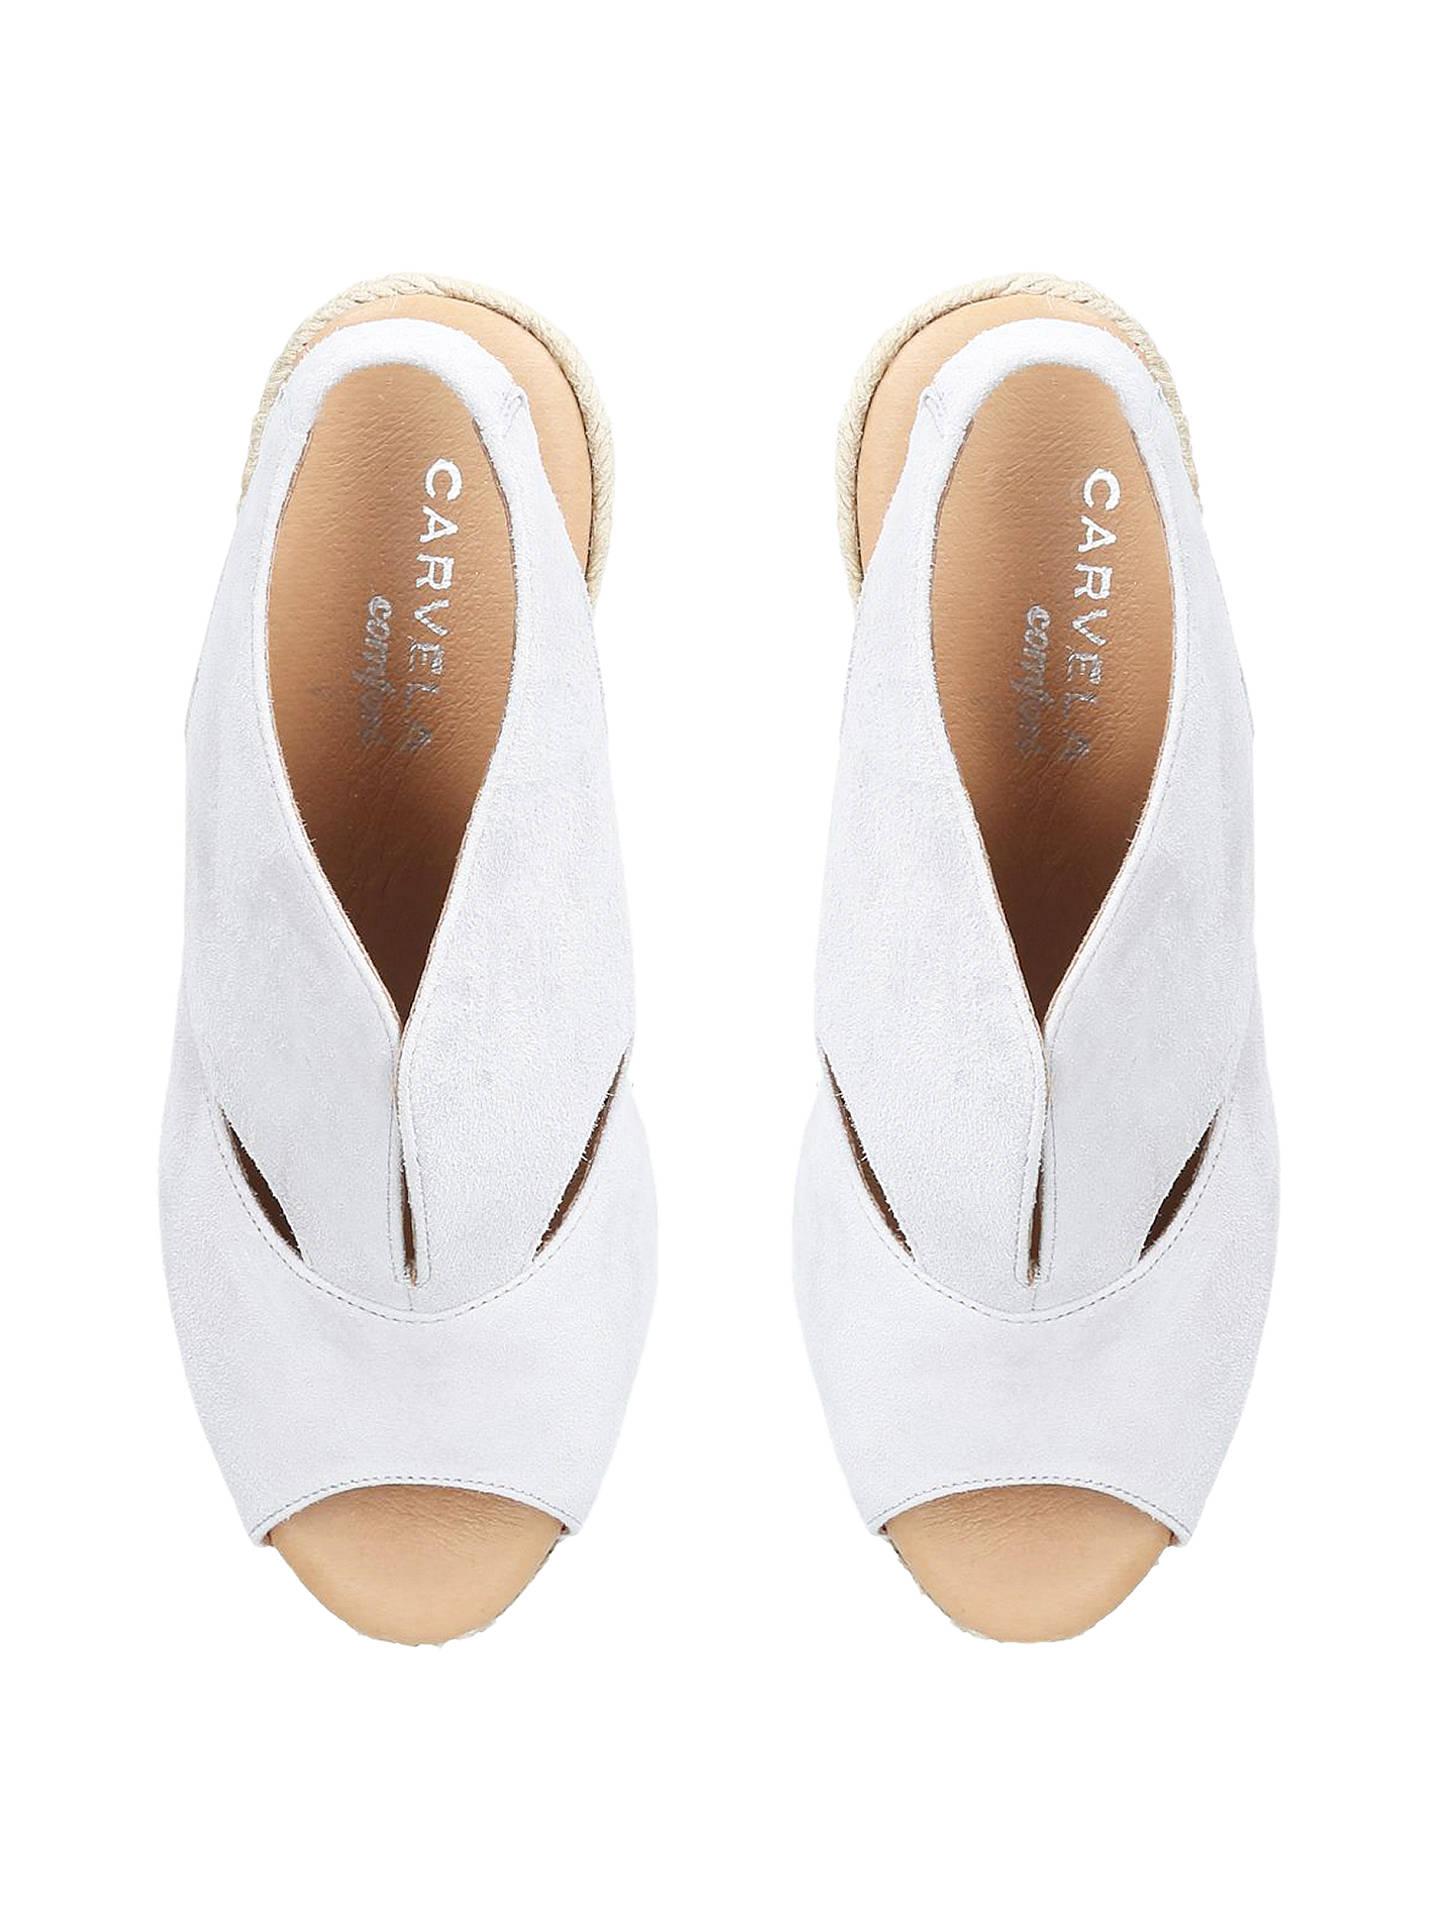 b02f0ab24c0 Buy Carvela Comfort Sara Wedge Heel Sandals